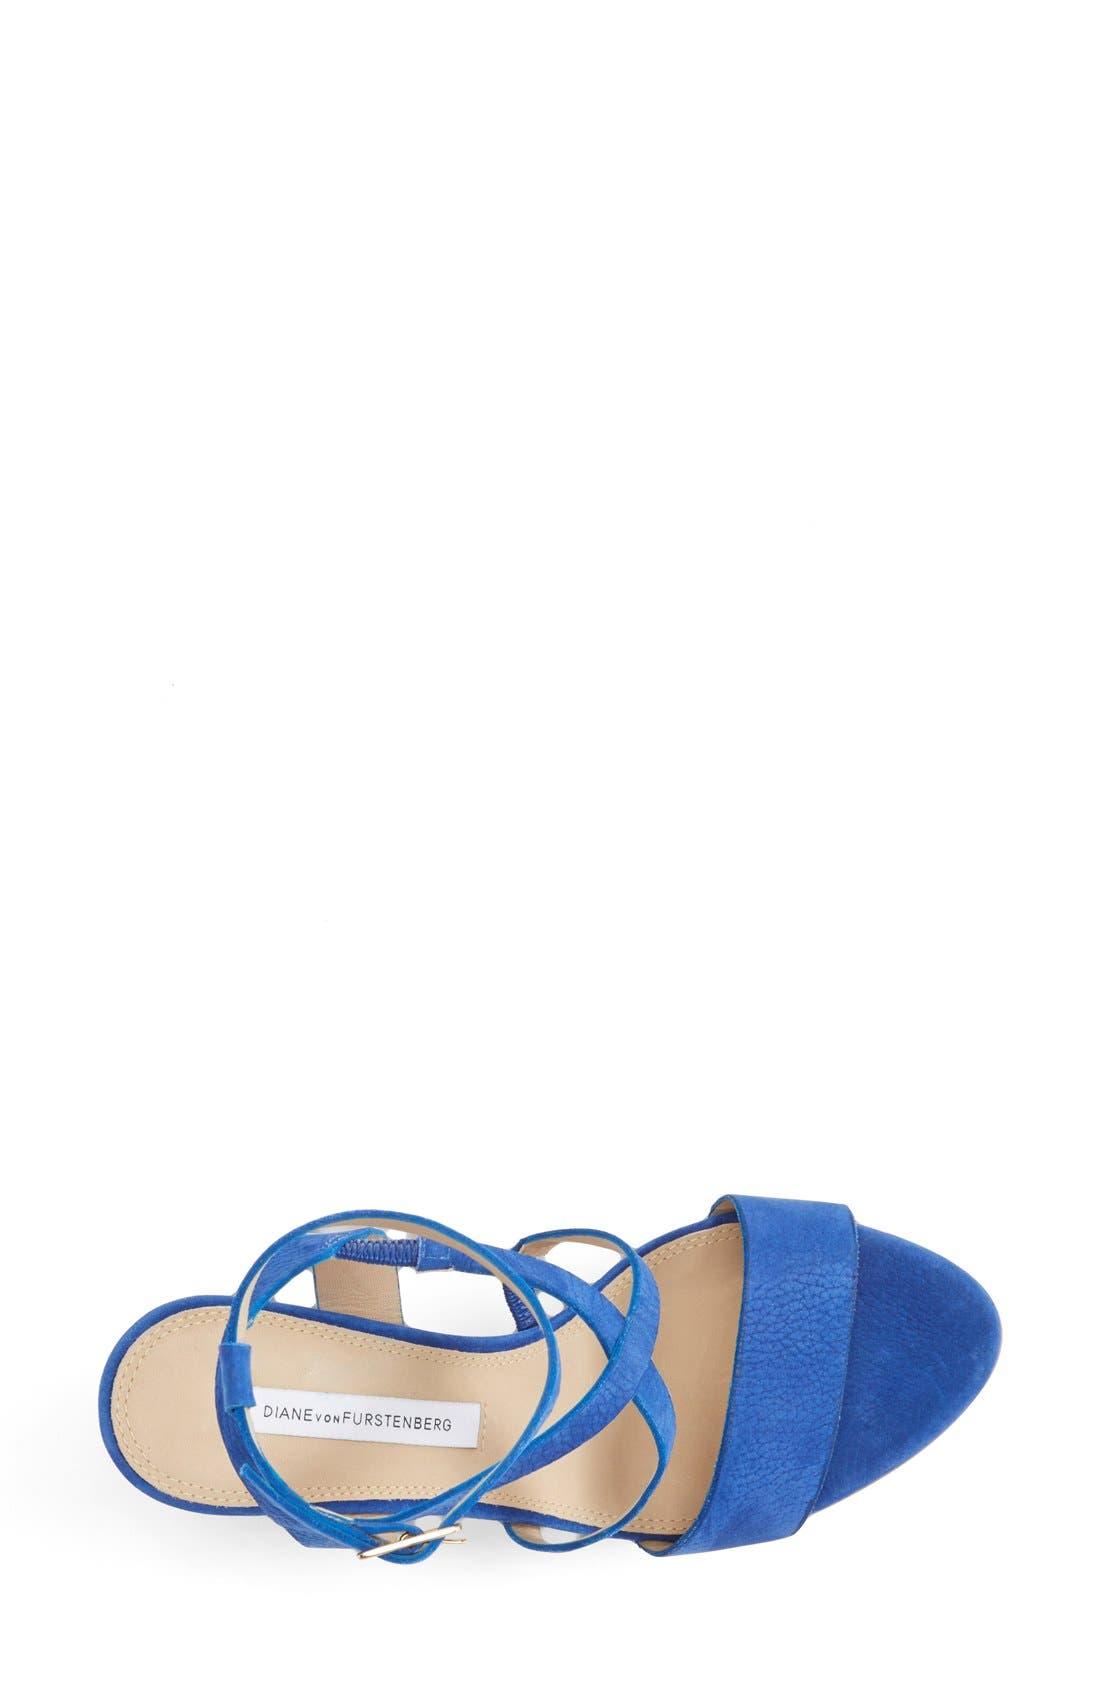 Alternate Image 3  - Diane von Furstenberg 'Lamille' Leather Platform Wedge Sandal (Women)